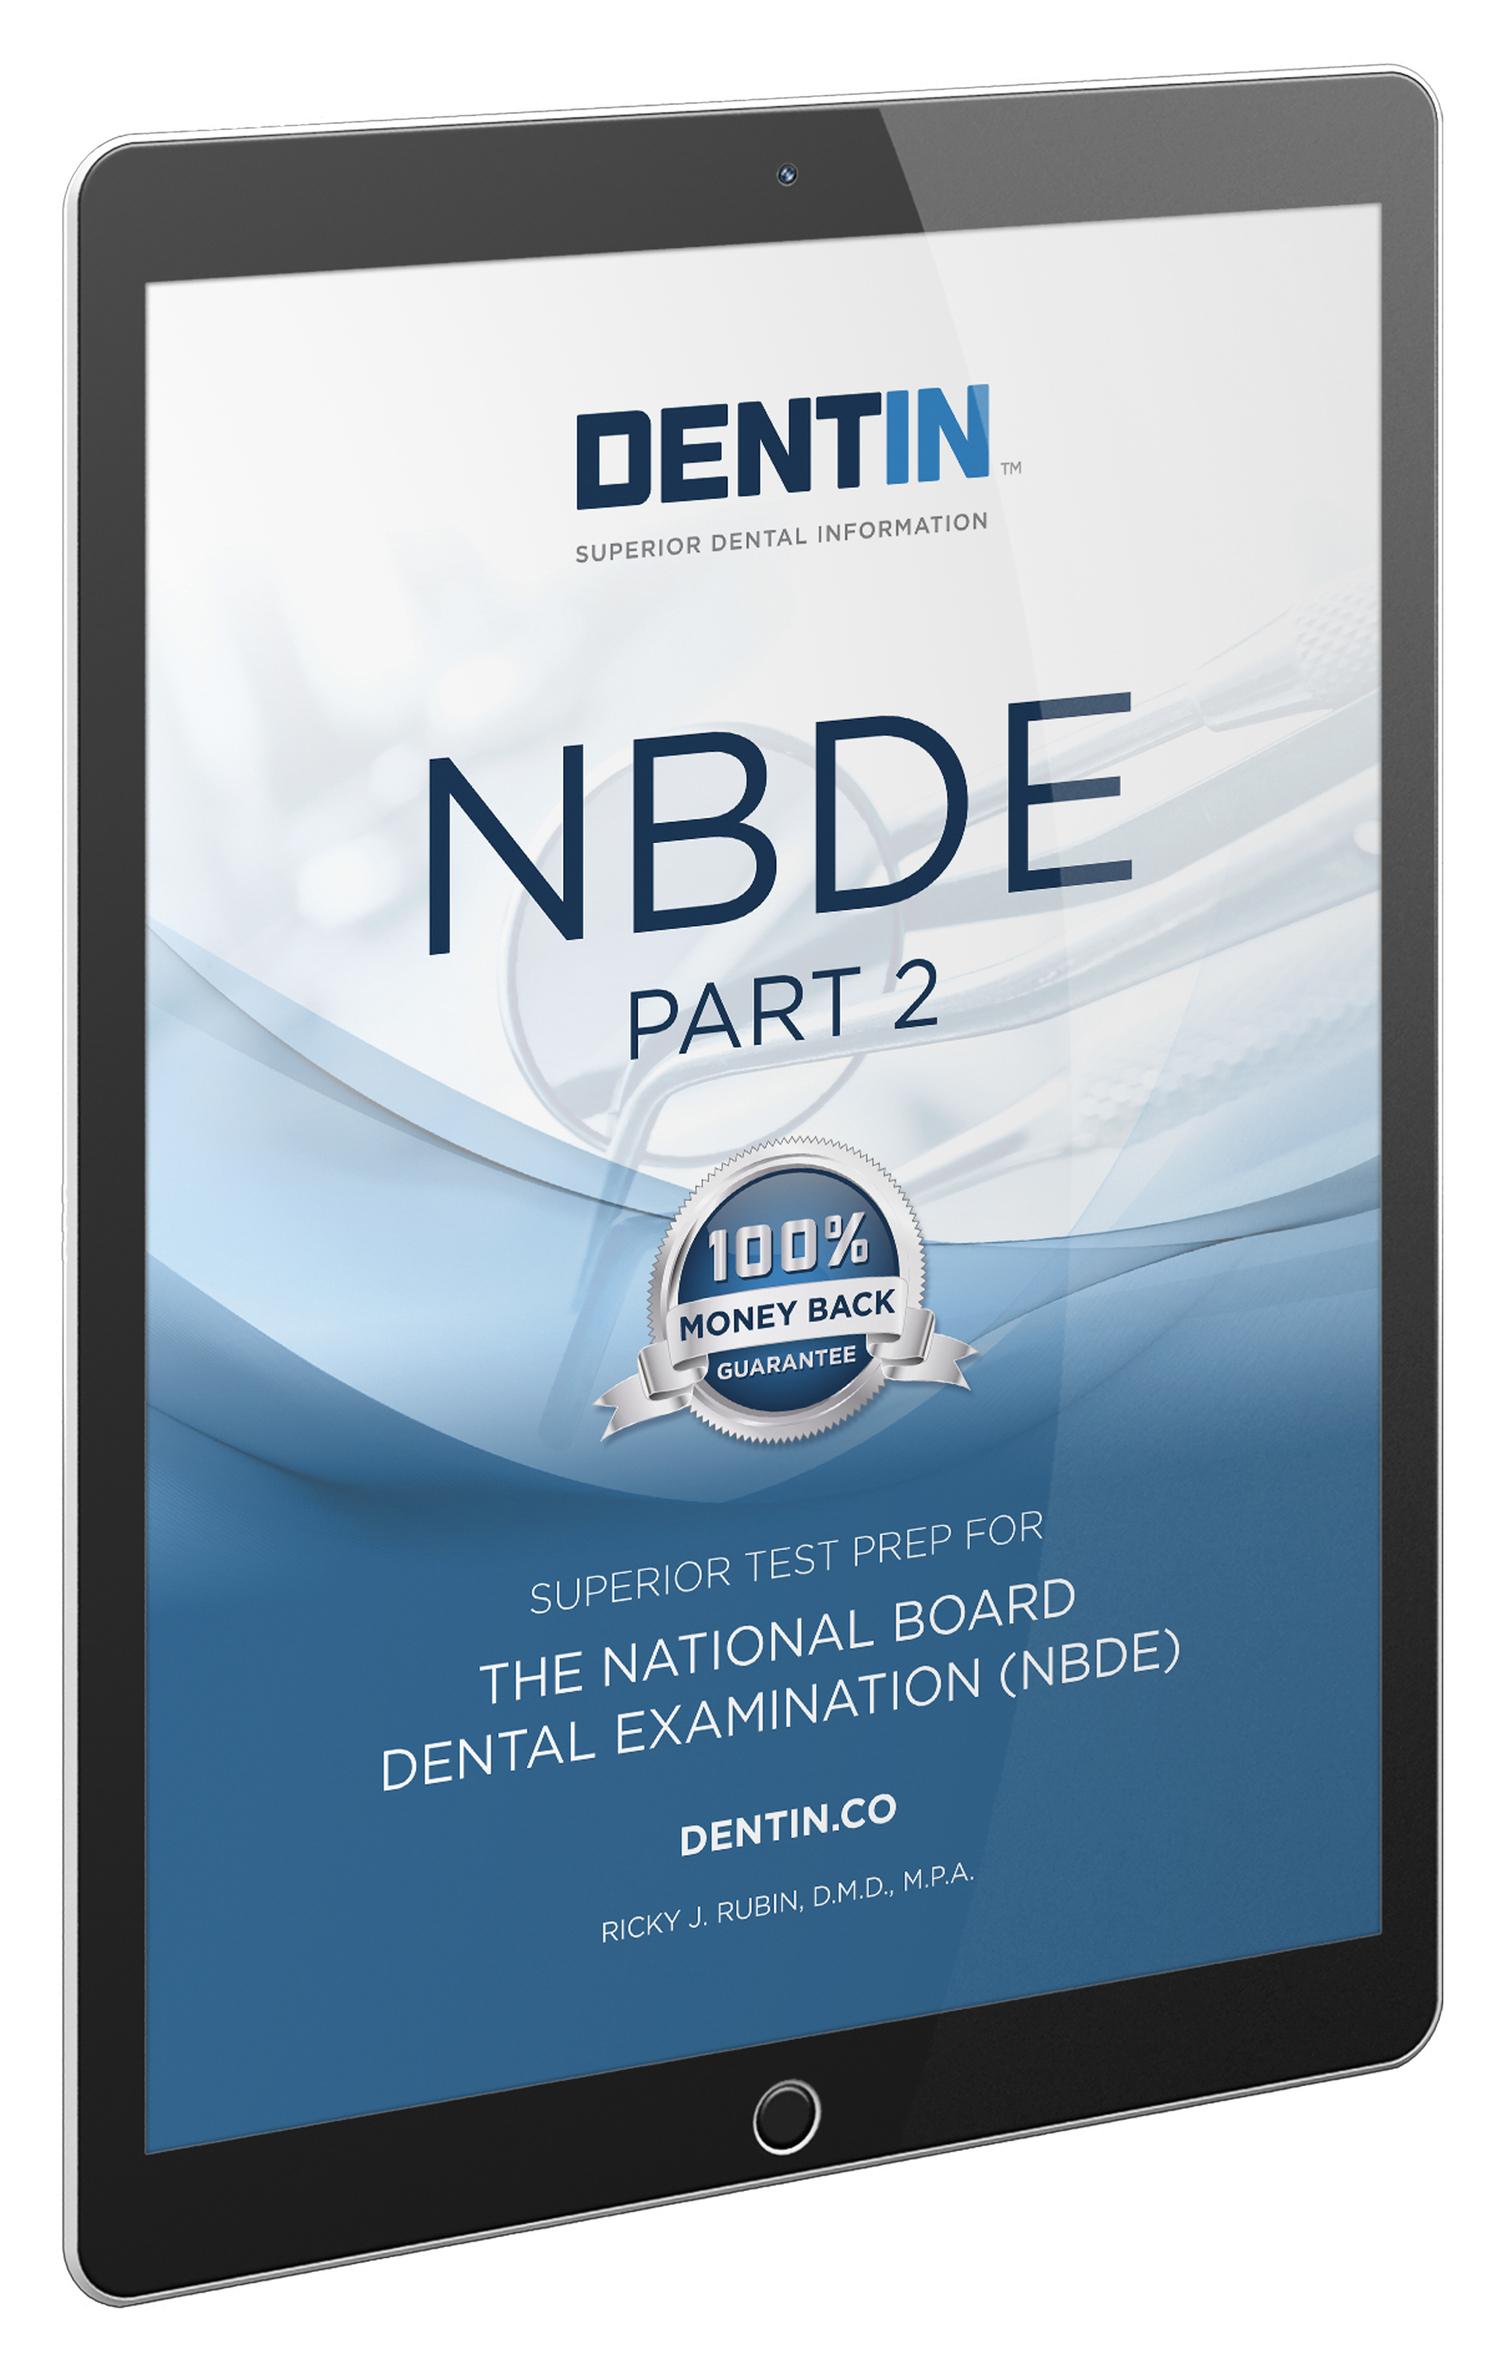 NBDE PART 2 EBOOK (2019) — Dentin | The Leader in Dental Exam Preparation